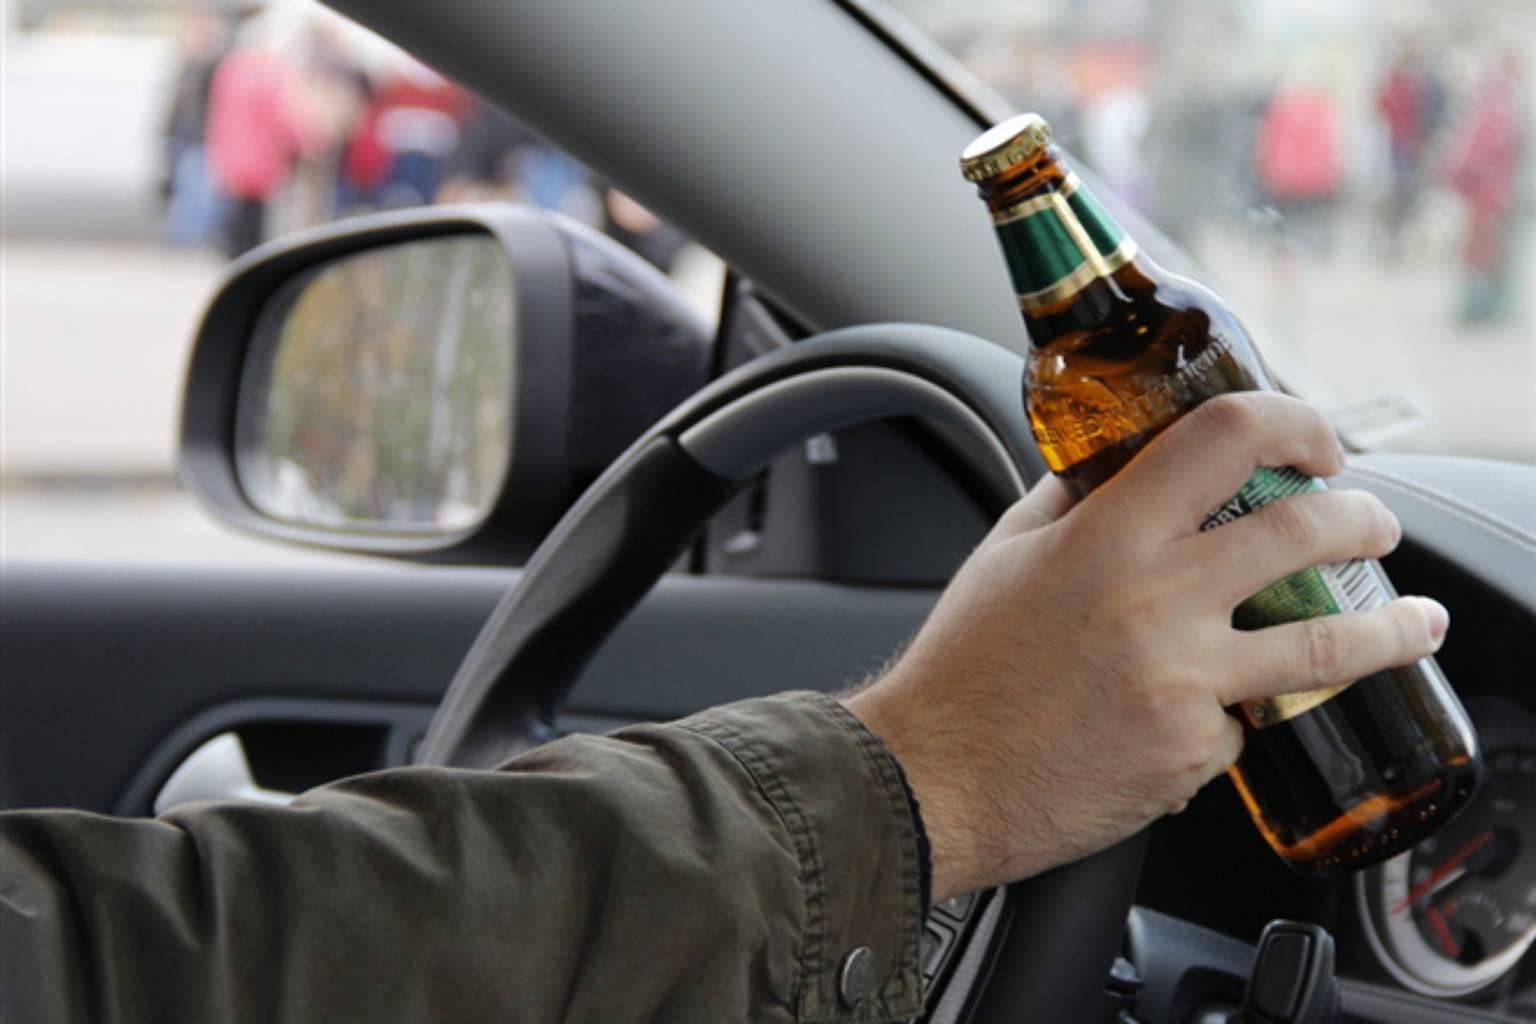 В Твери задержали пьяного водителя без прав